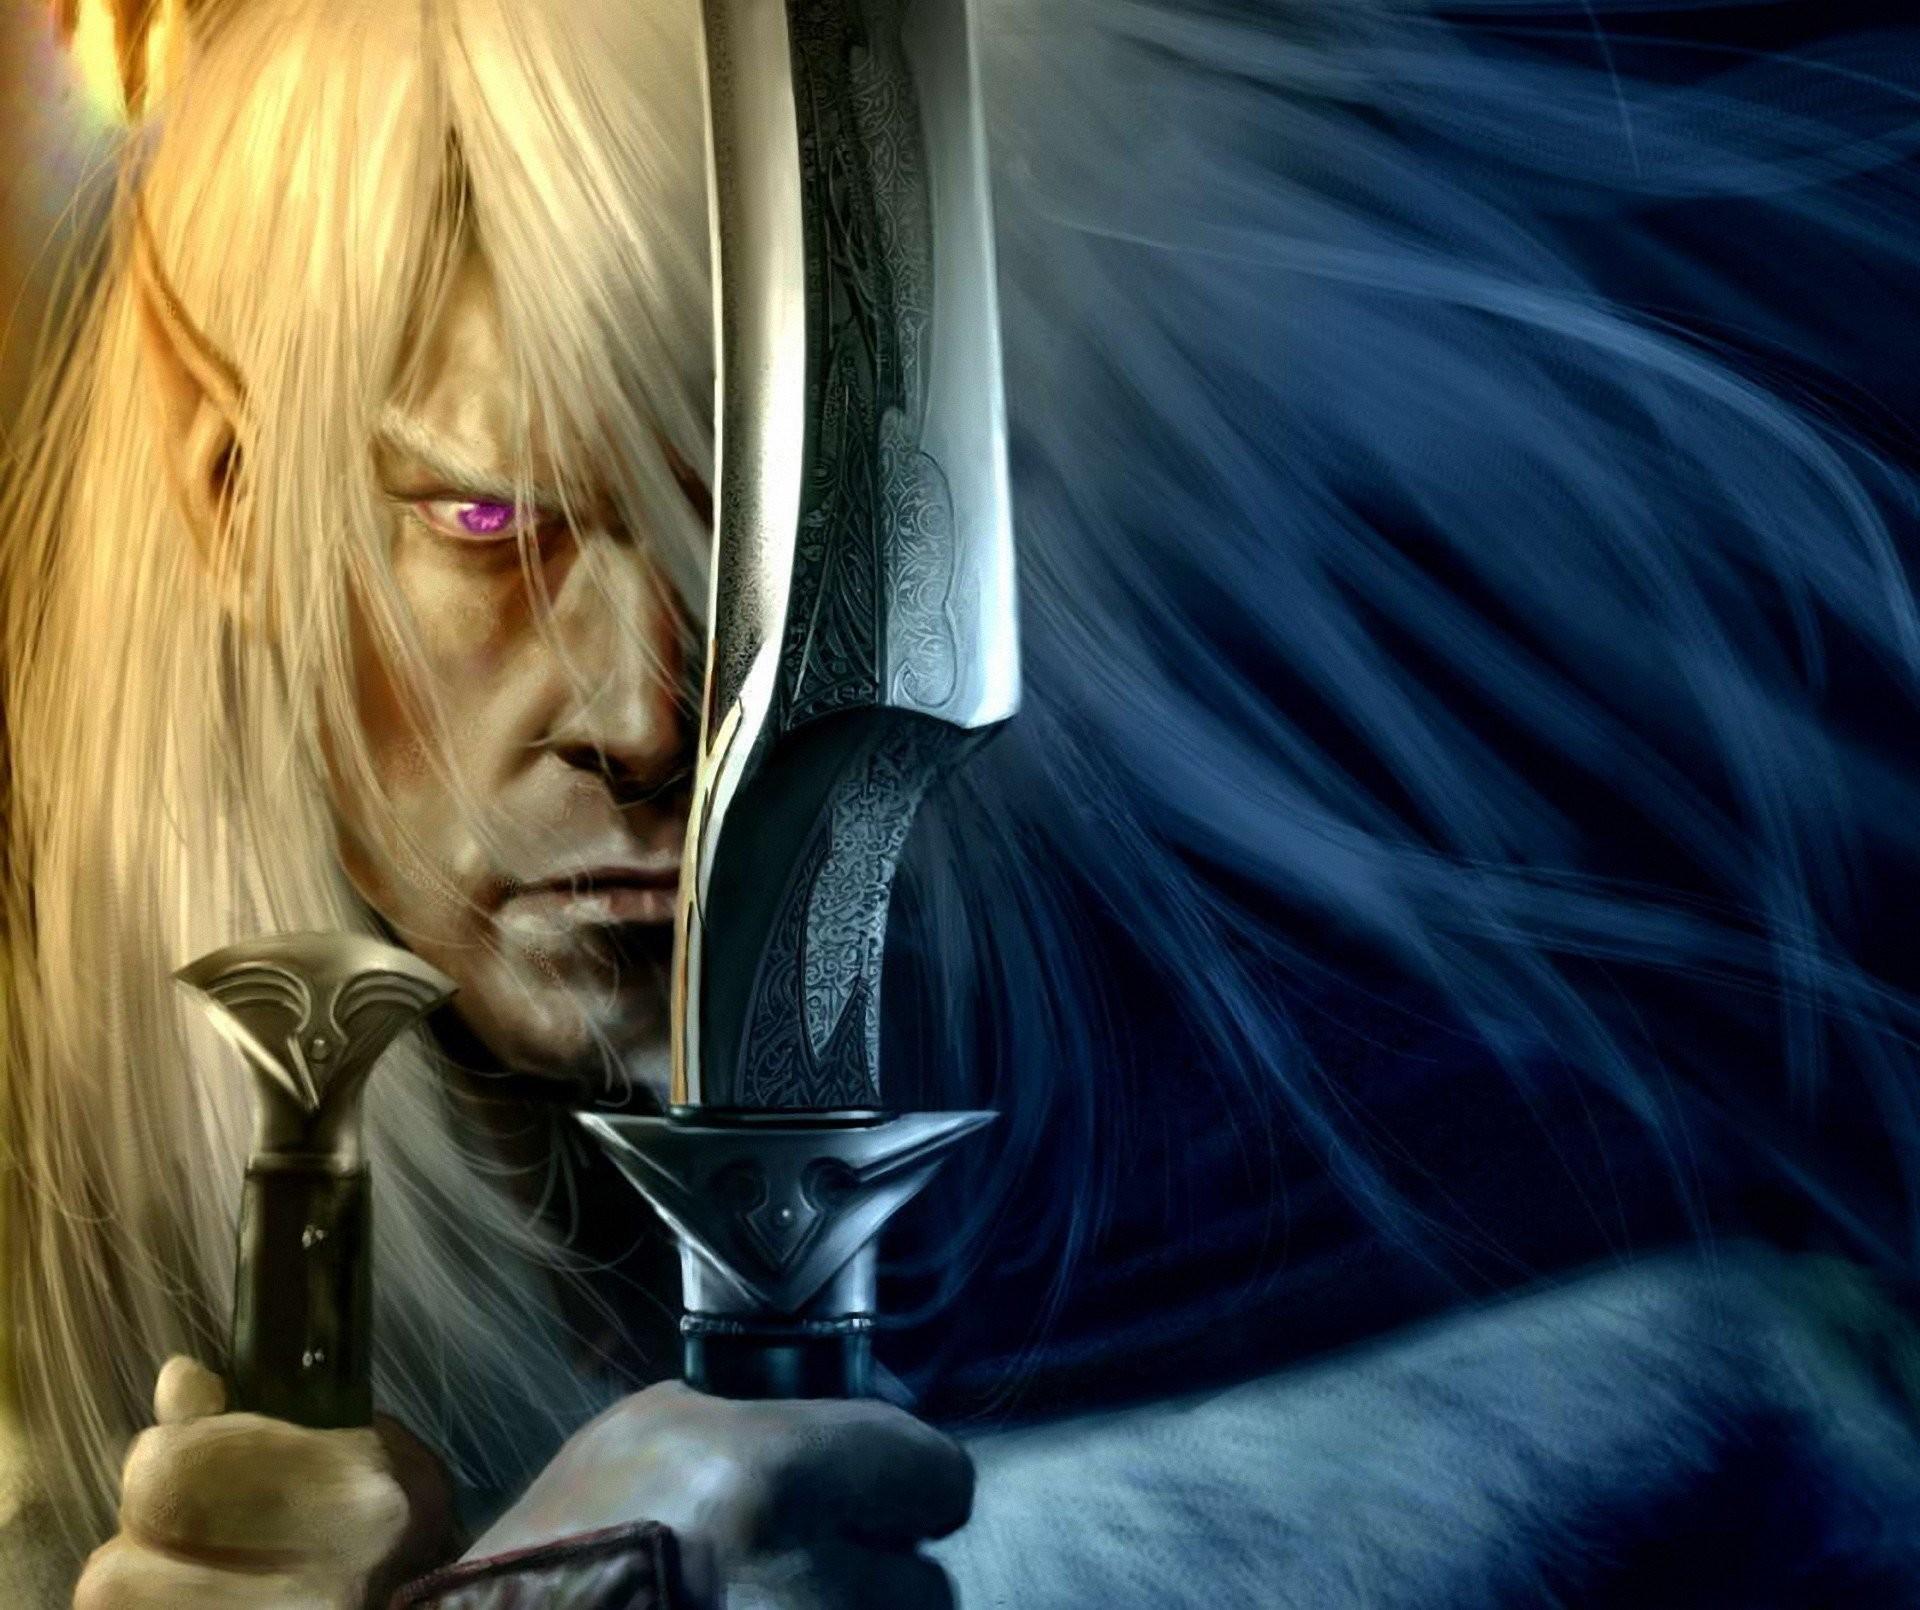 art drow elf weapon saber robert salvatore robert salvatore dark elf drizzt  drizzt do'urden